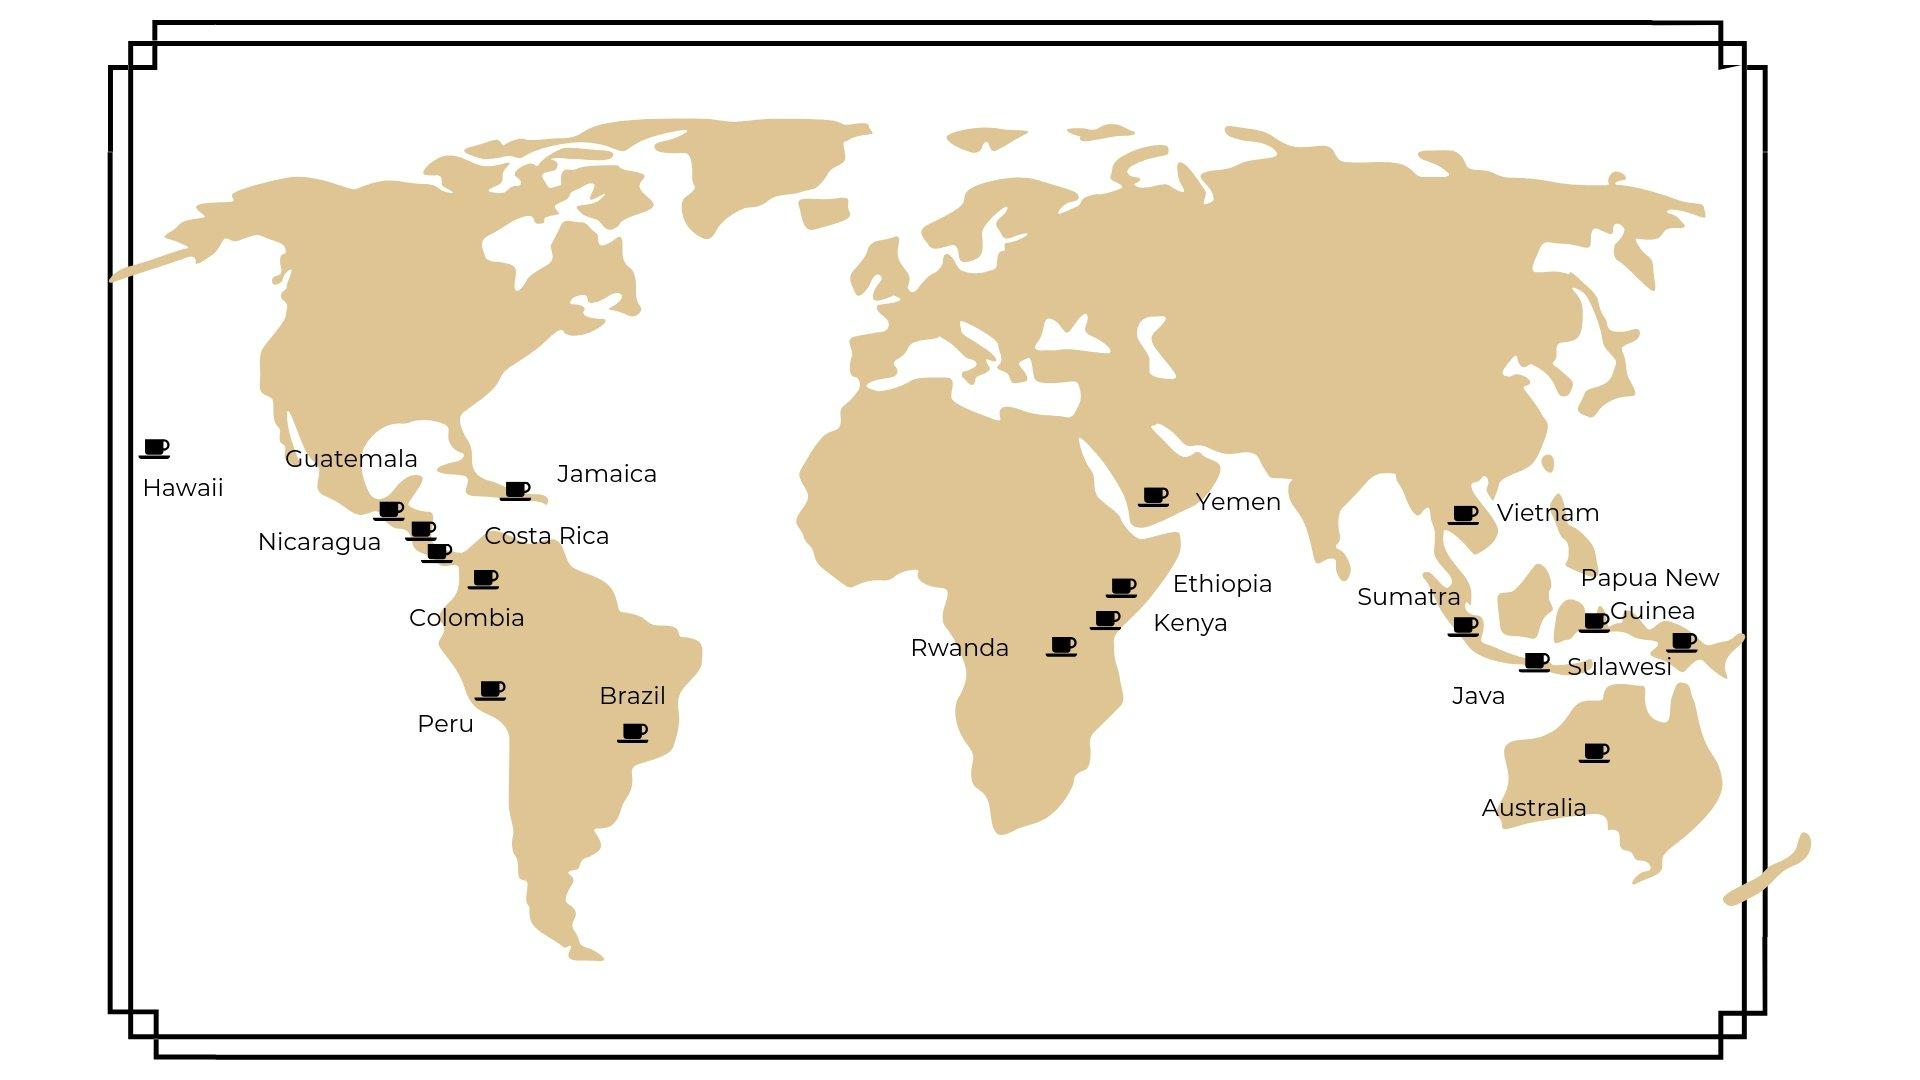 Coffee bean types around the world